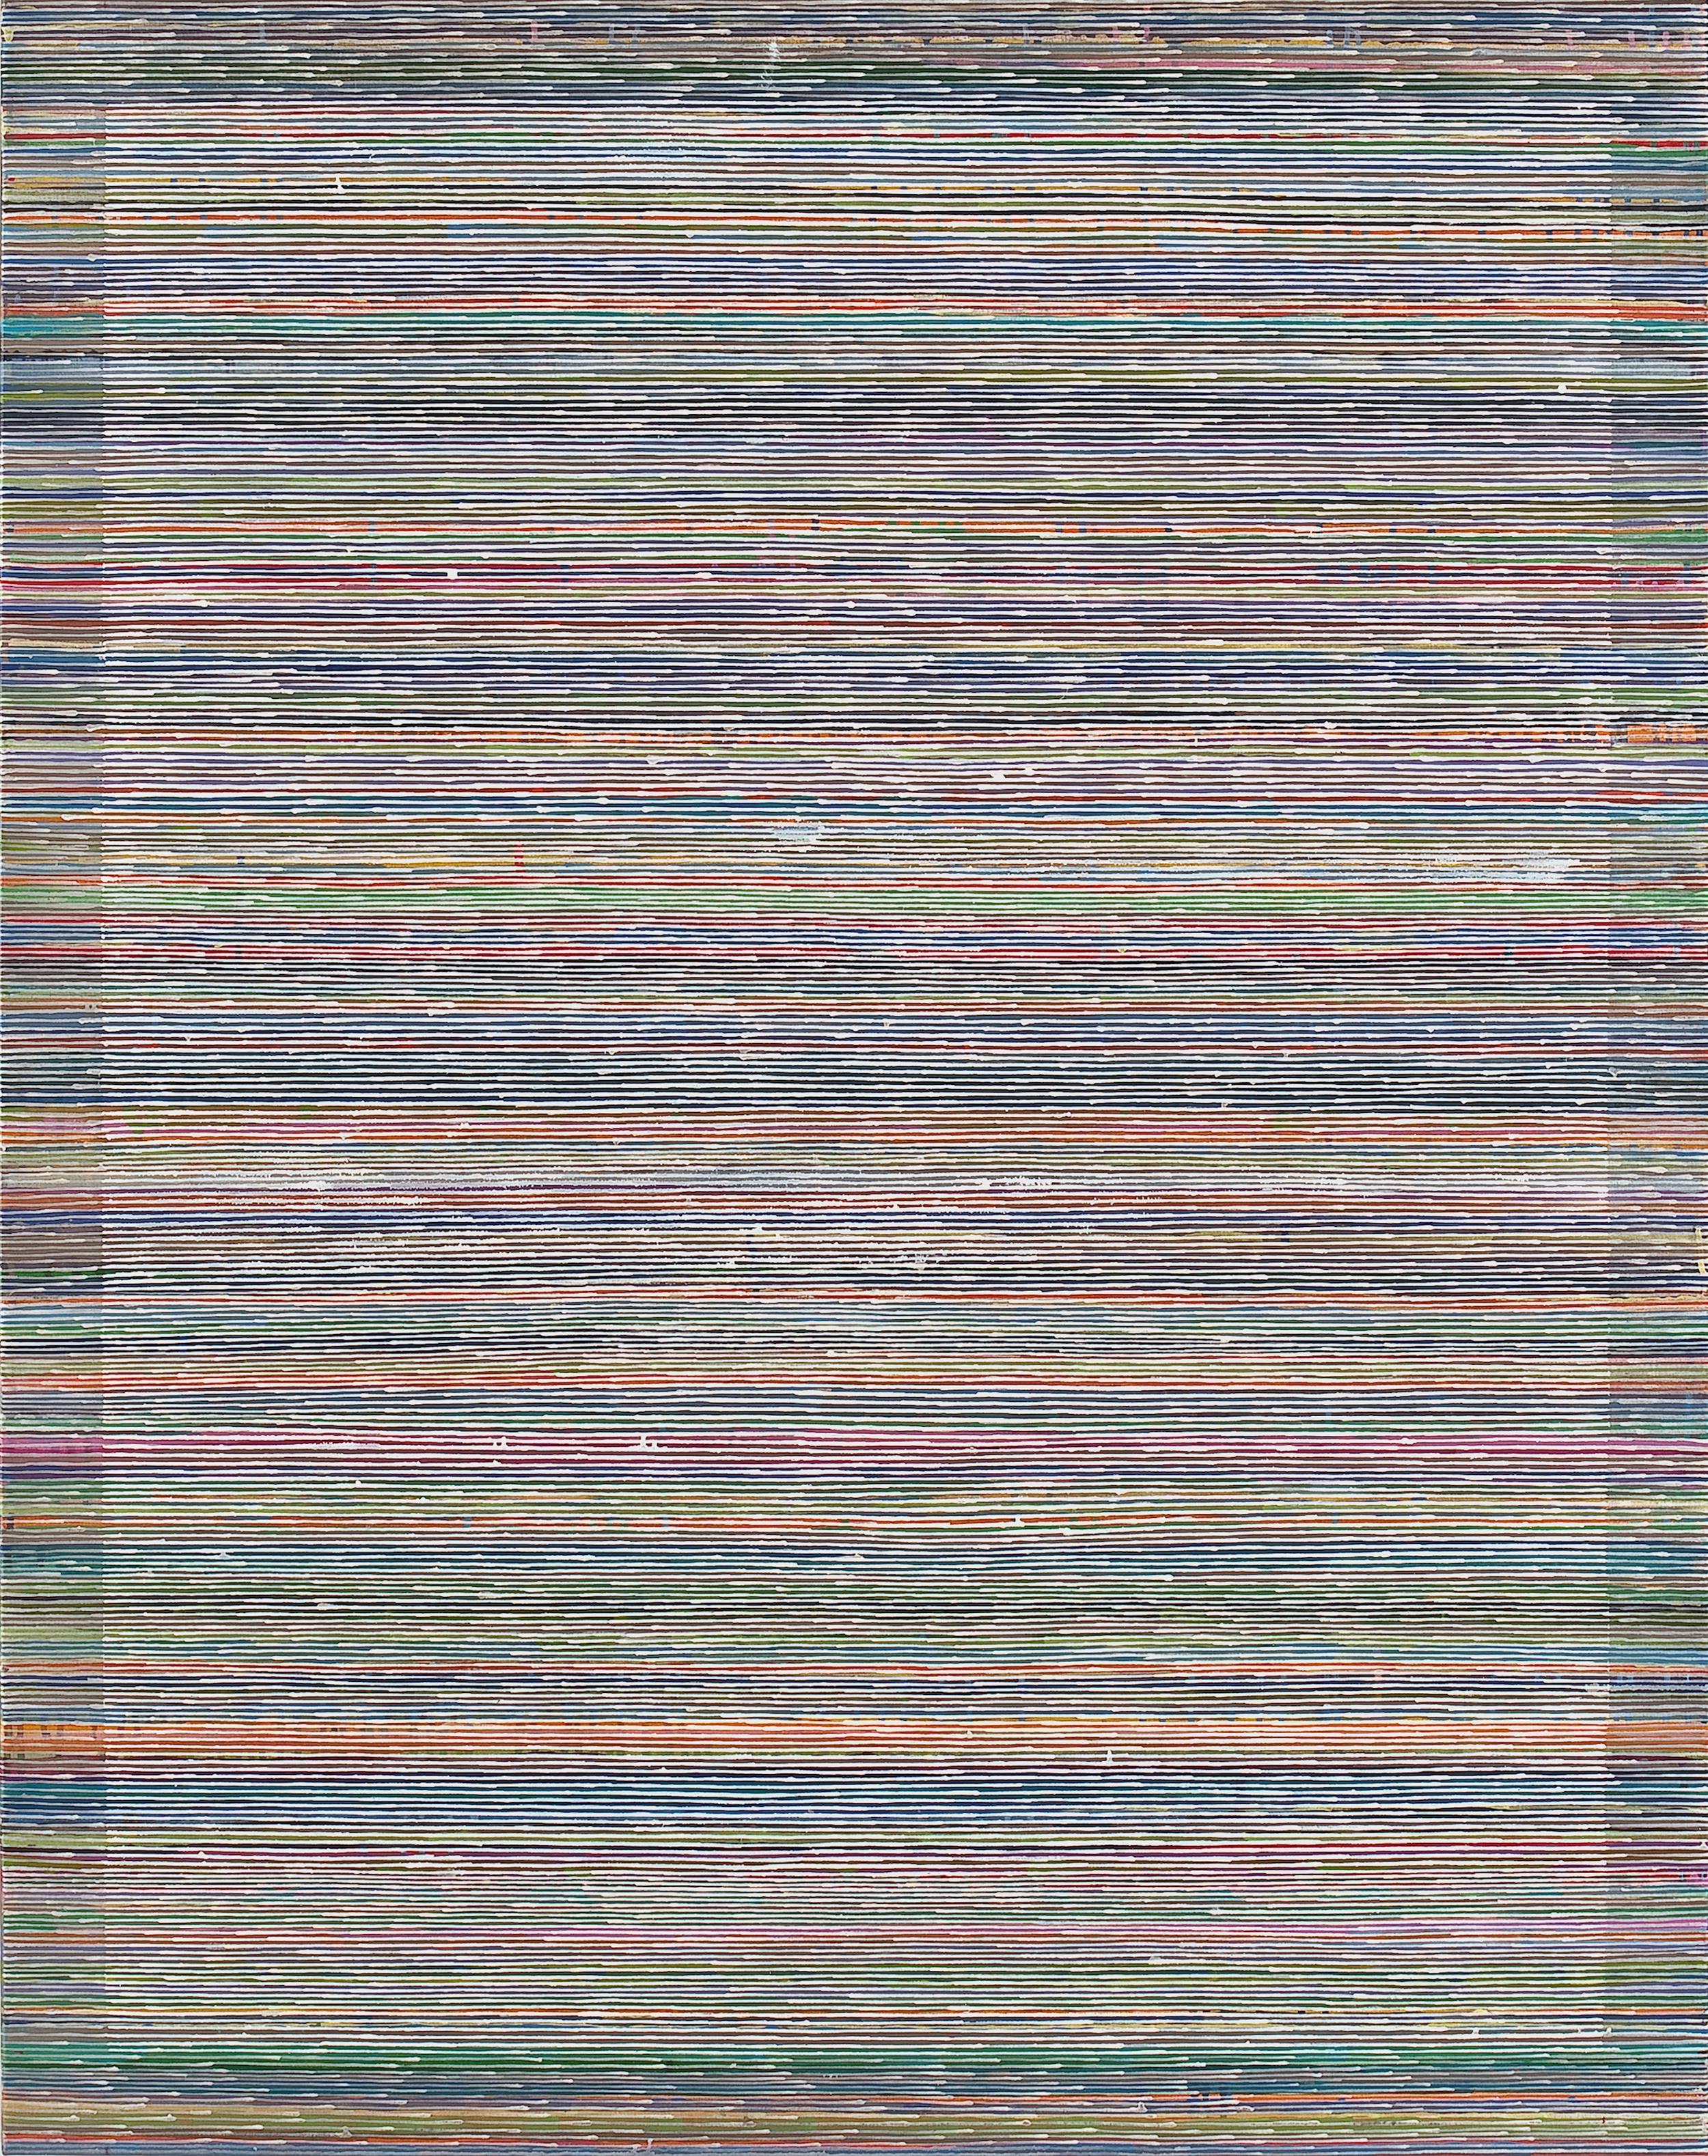 2009 Breathing Pattern #1. Oil on Linen. 1150x150cm  .jpg